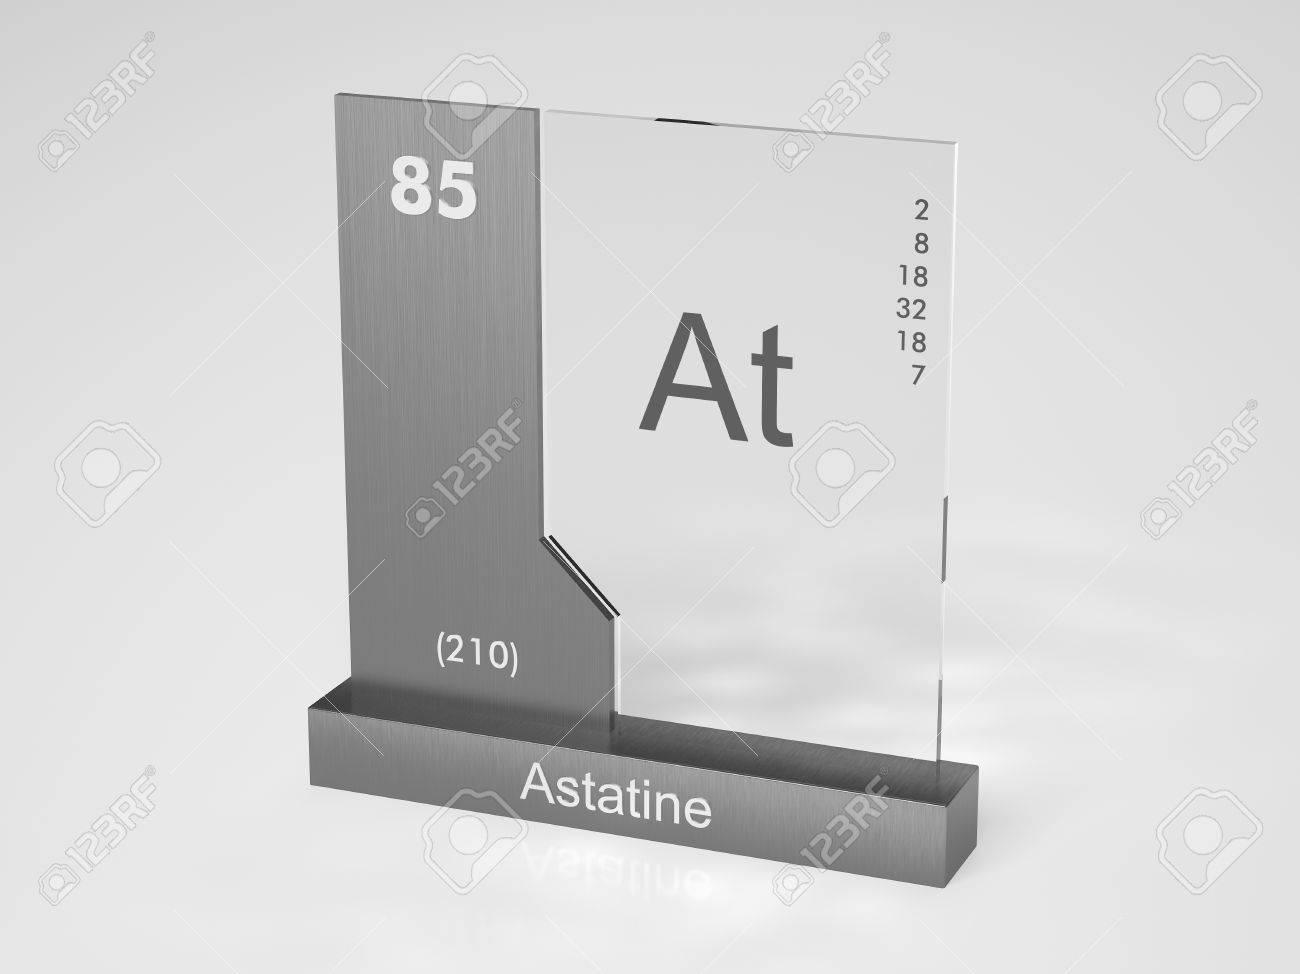 Astatine symbol periodic table choice image periodic table images astatine symbol at chemical element of the periodic table astatine symbol at chemical element of the gamestrikefo Image collections